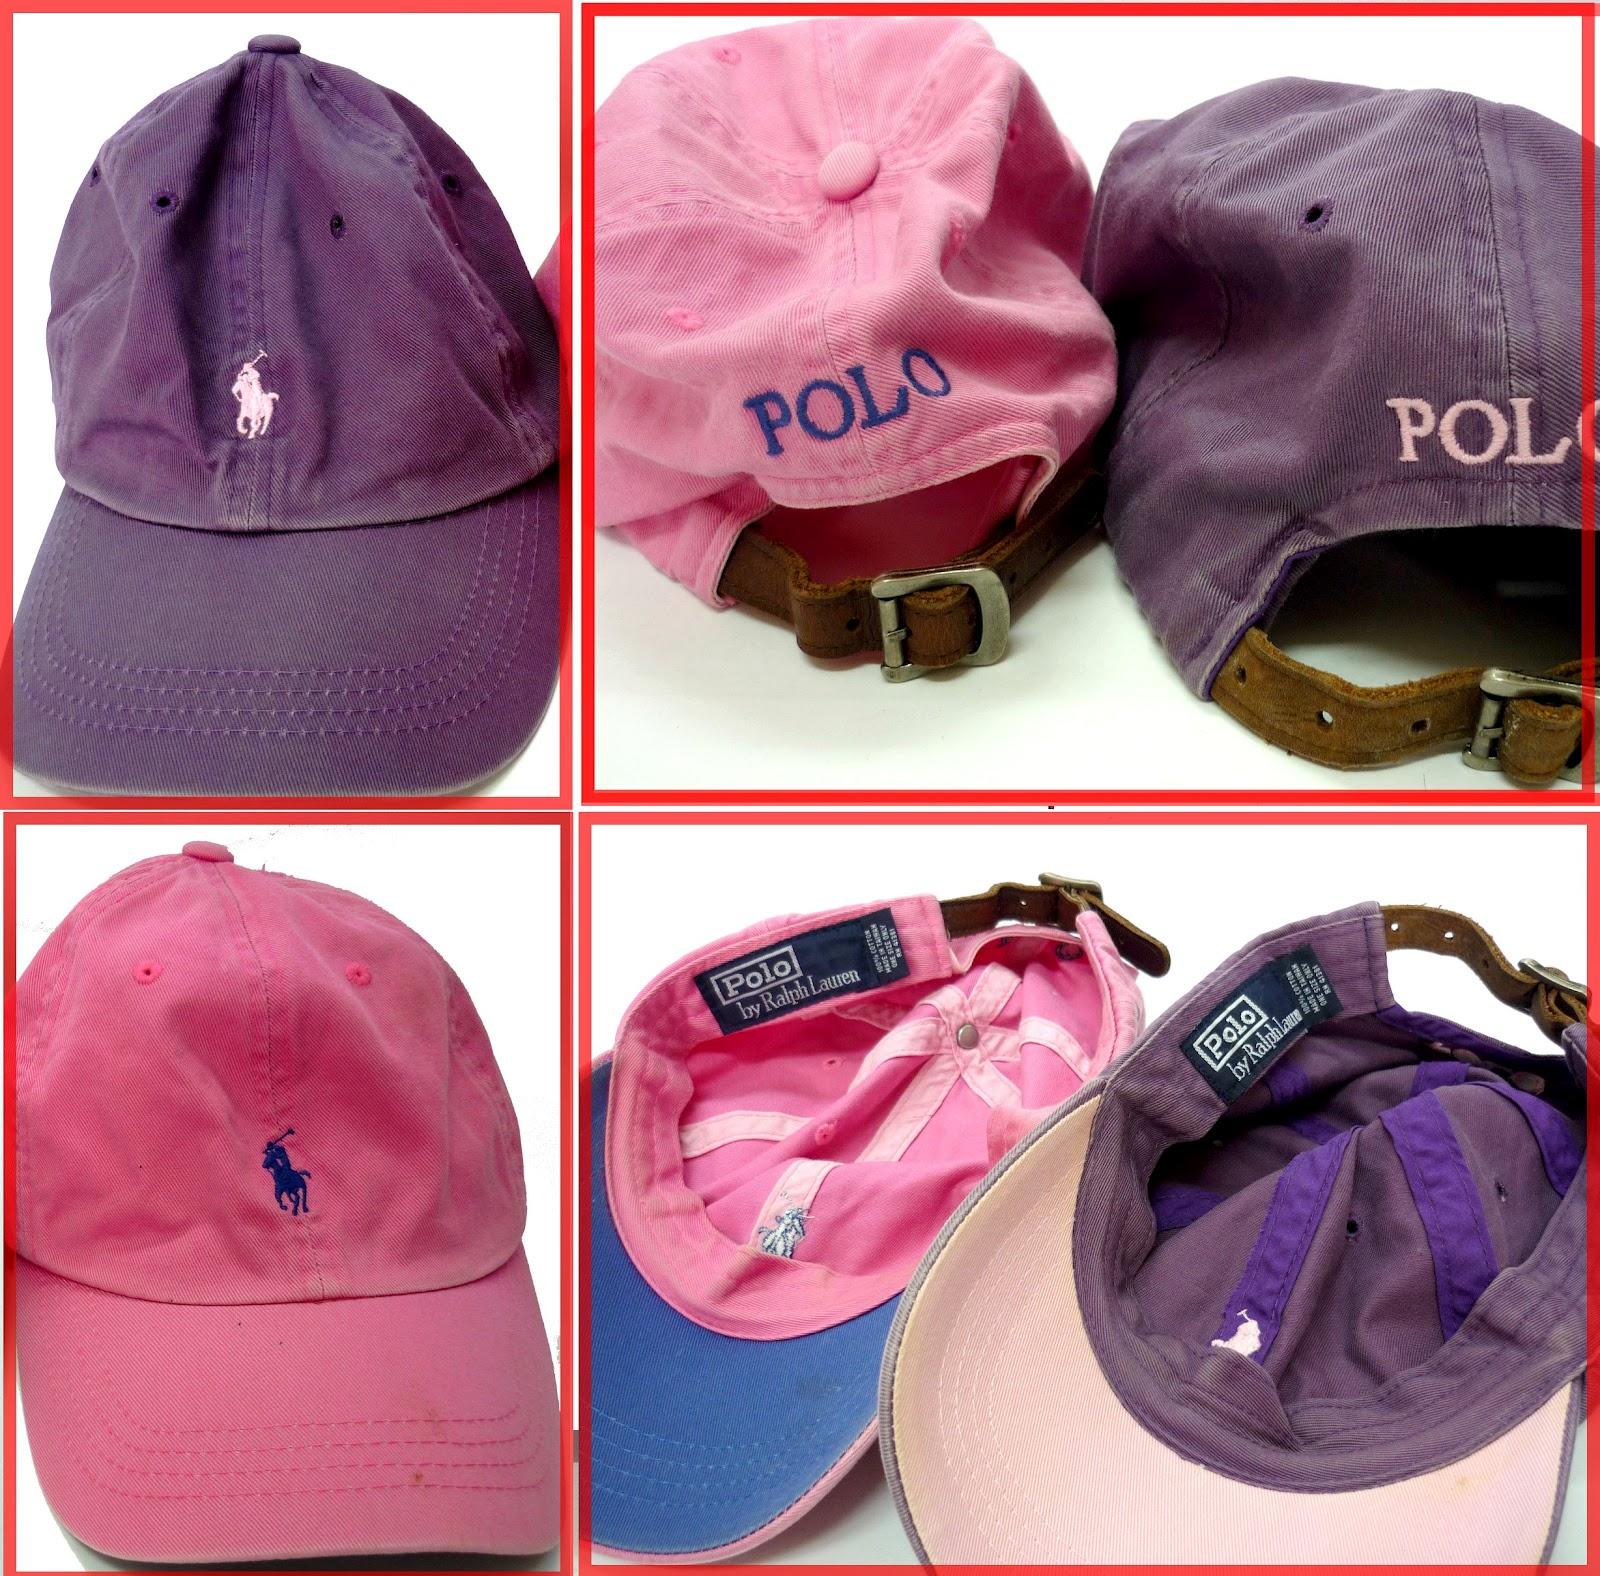 abfc4899dd5 RCHYbundle  POLO ralph lauren purple and pink cap